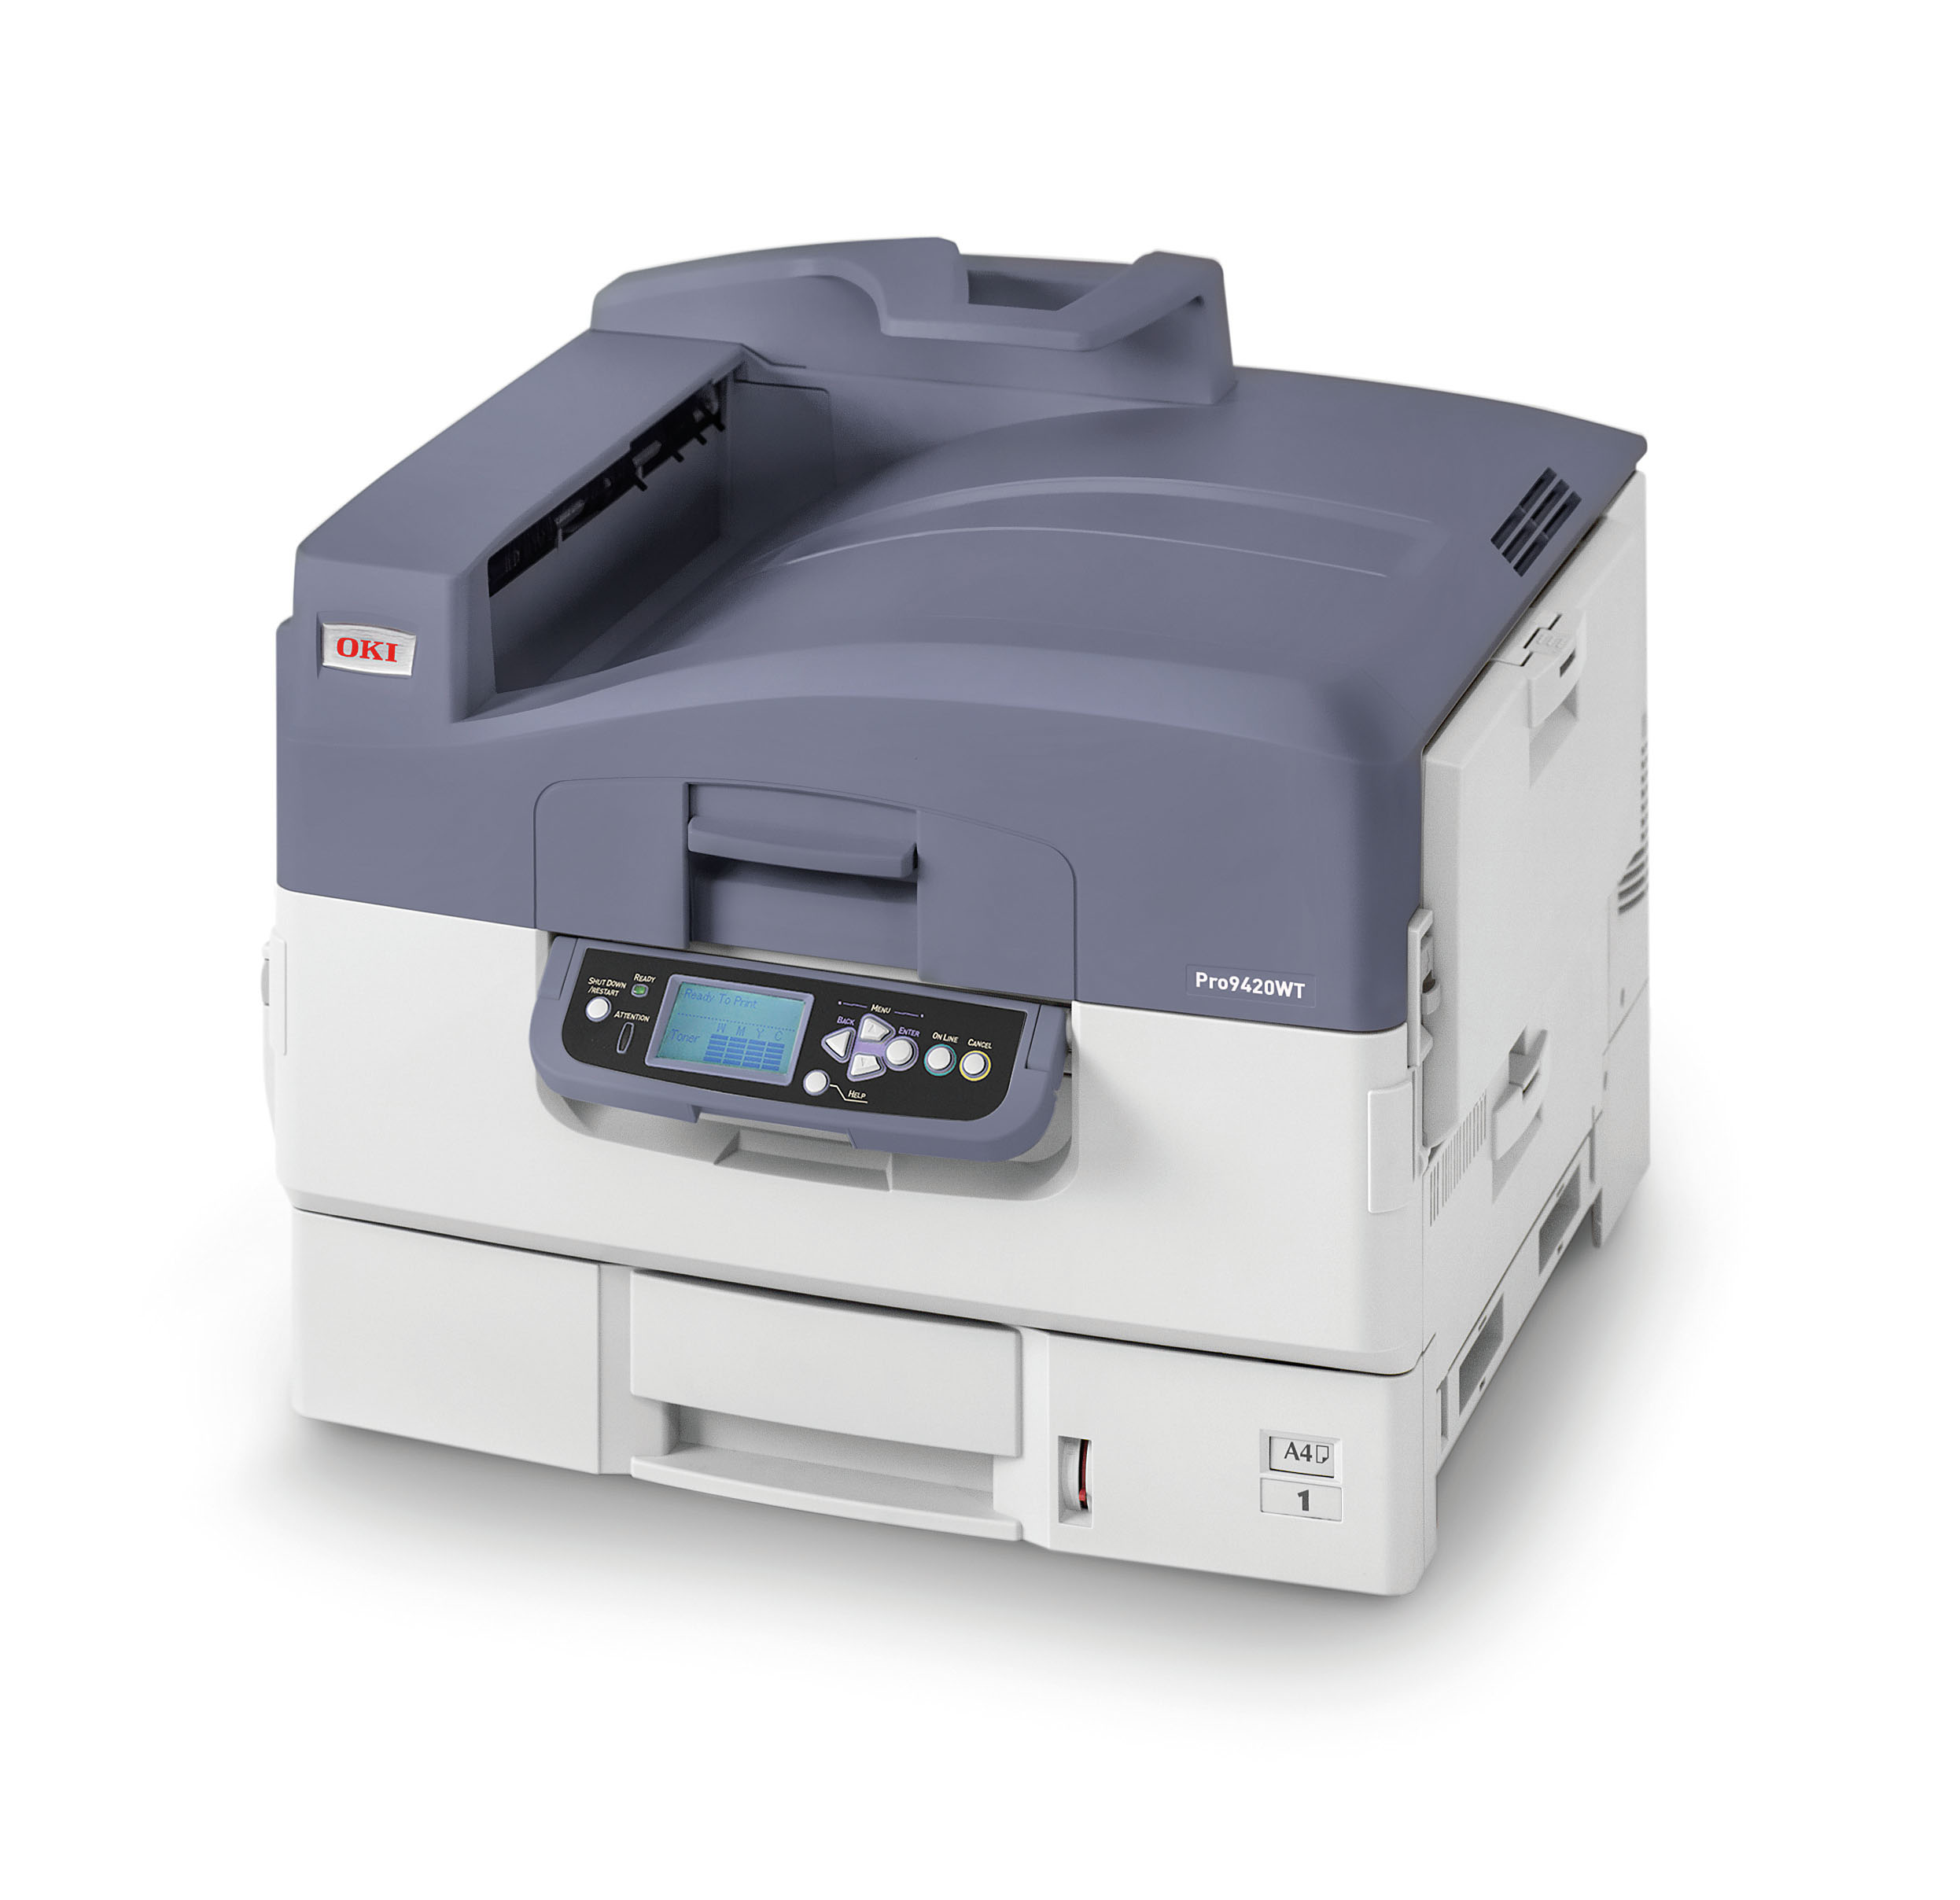 OKI Pro9420WT Beyaz Tonerli A4 Renkli Yazıcı